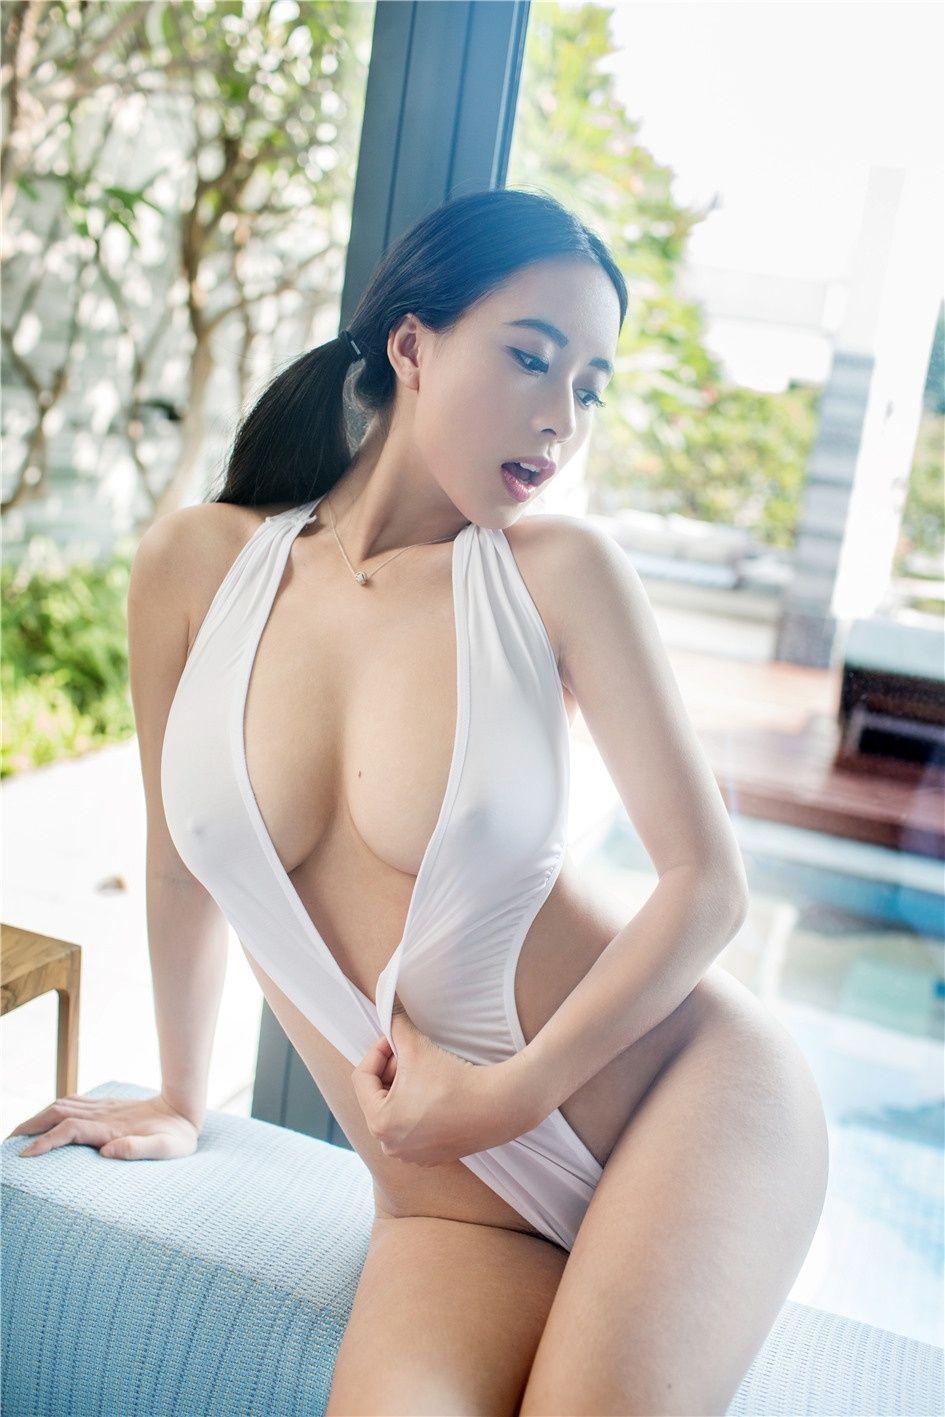 tuigirl推女郎]模特黄可 性感巨乳风骚诱惑写真no.66 | huang ke xx